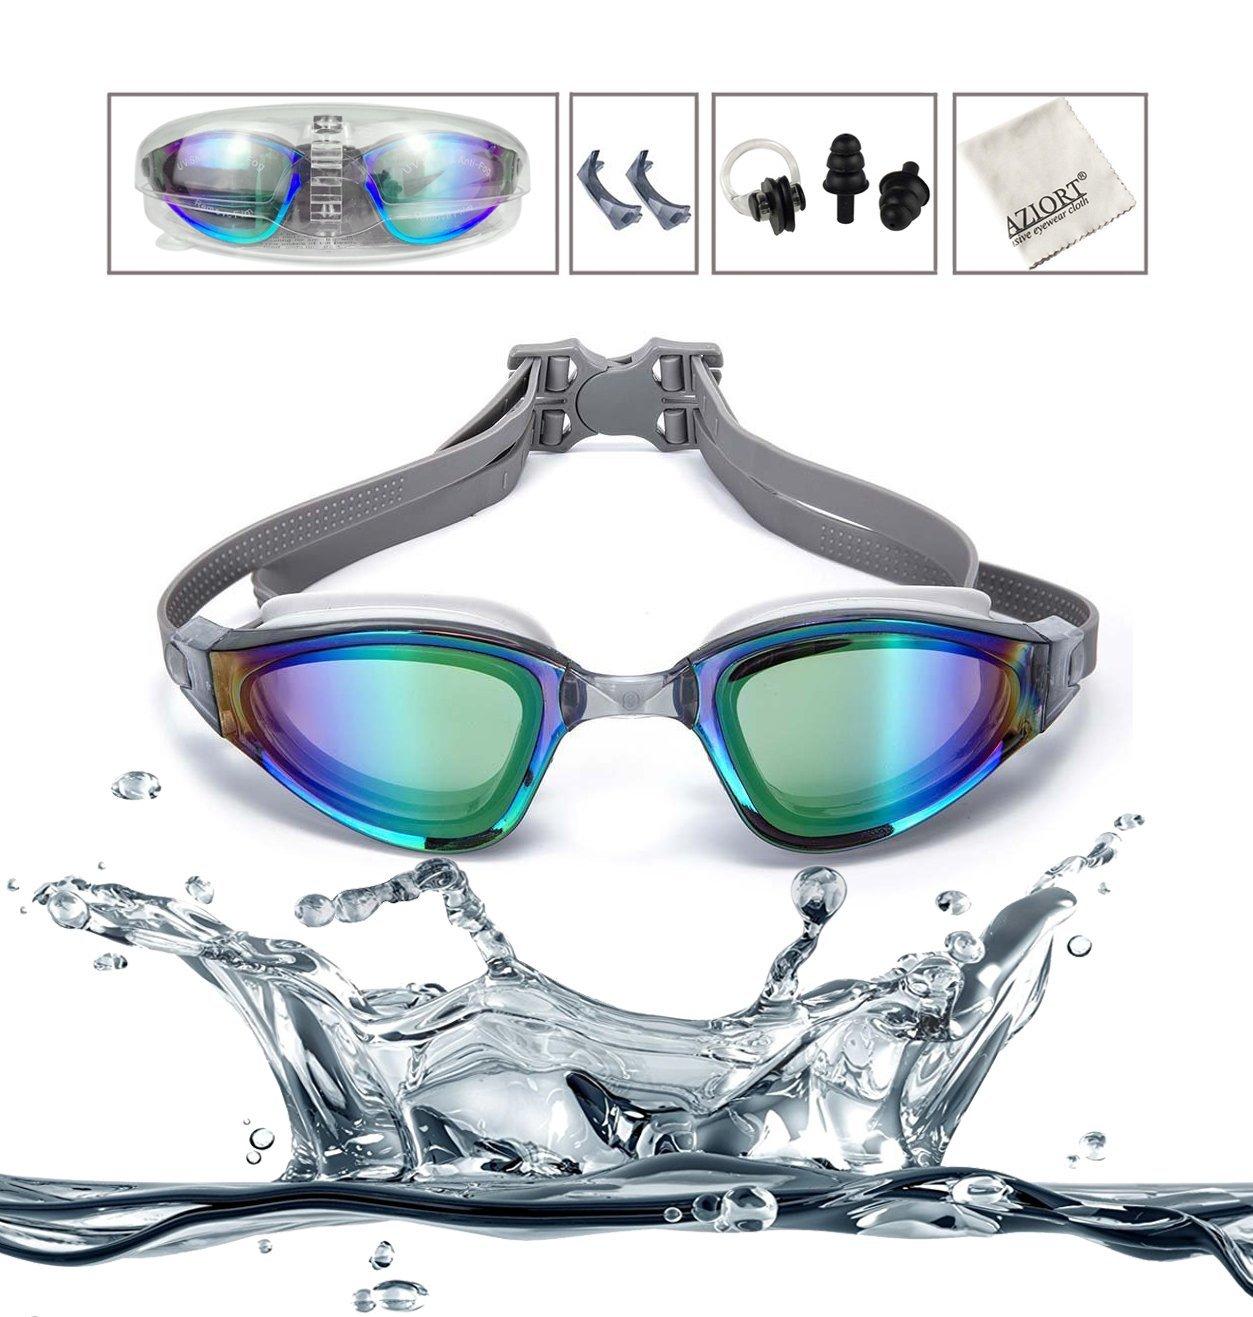 da447f0d05af Get Quotations · Maziort Swim Goggles